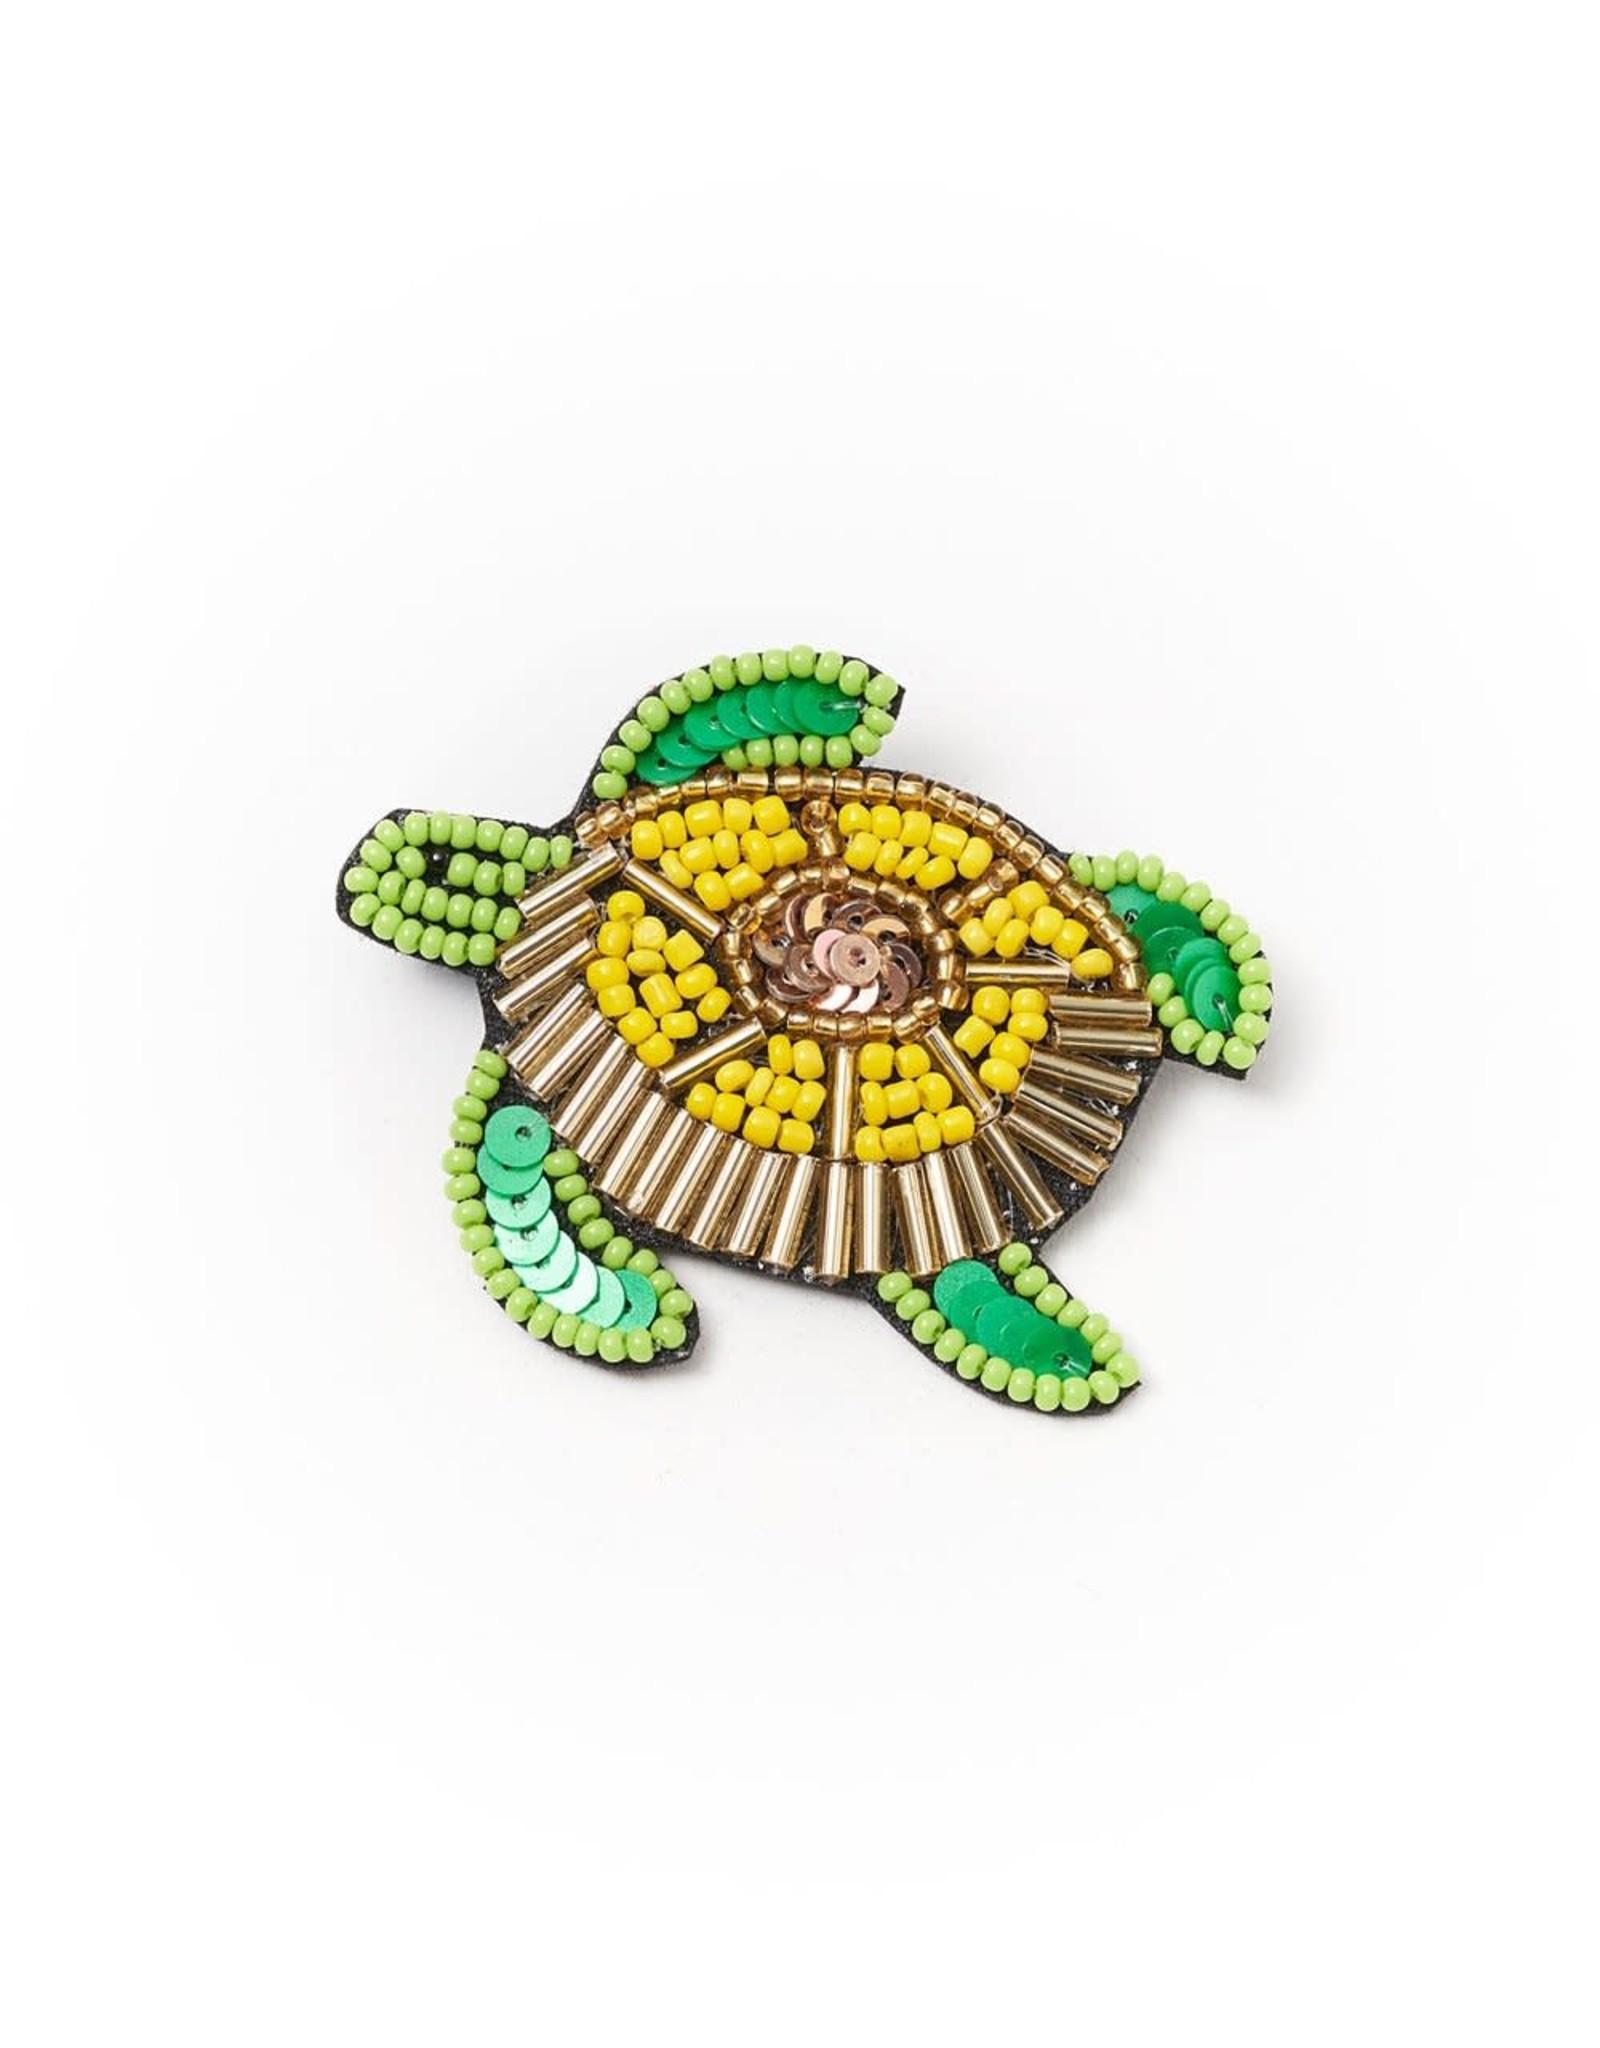 Matr Boomie Bala Mani Turtle Brooch, India